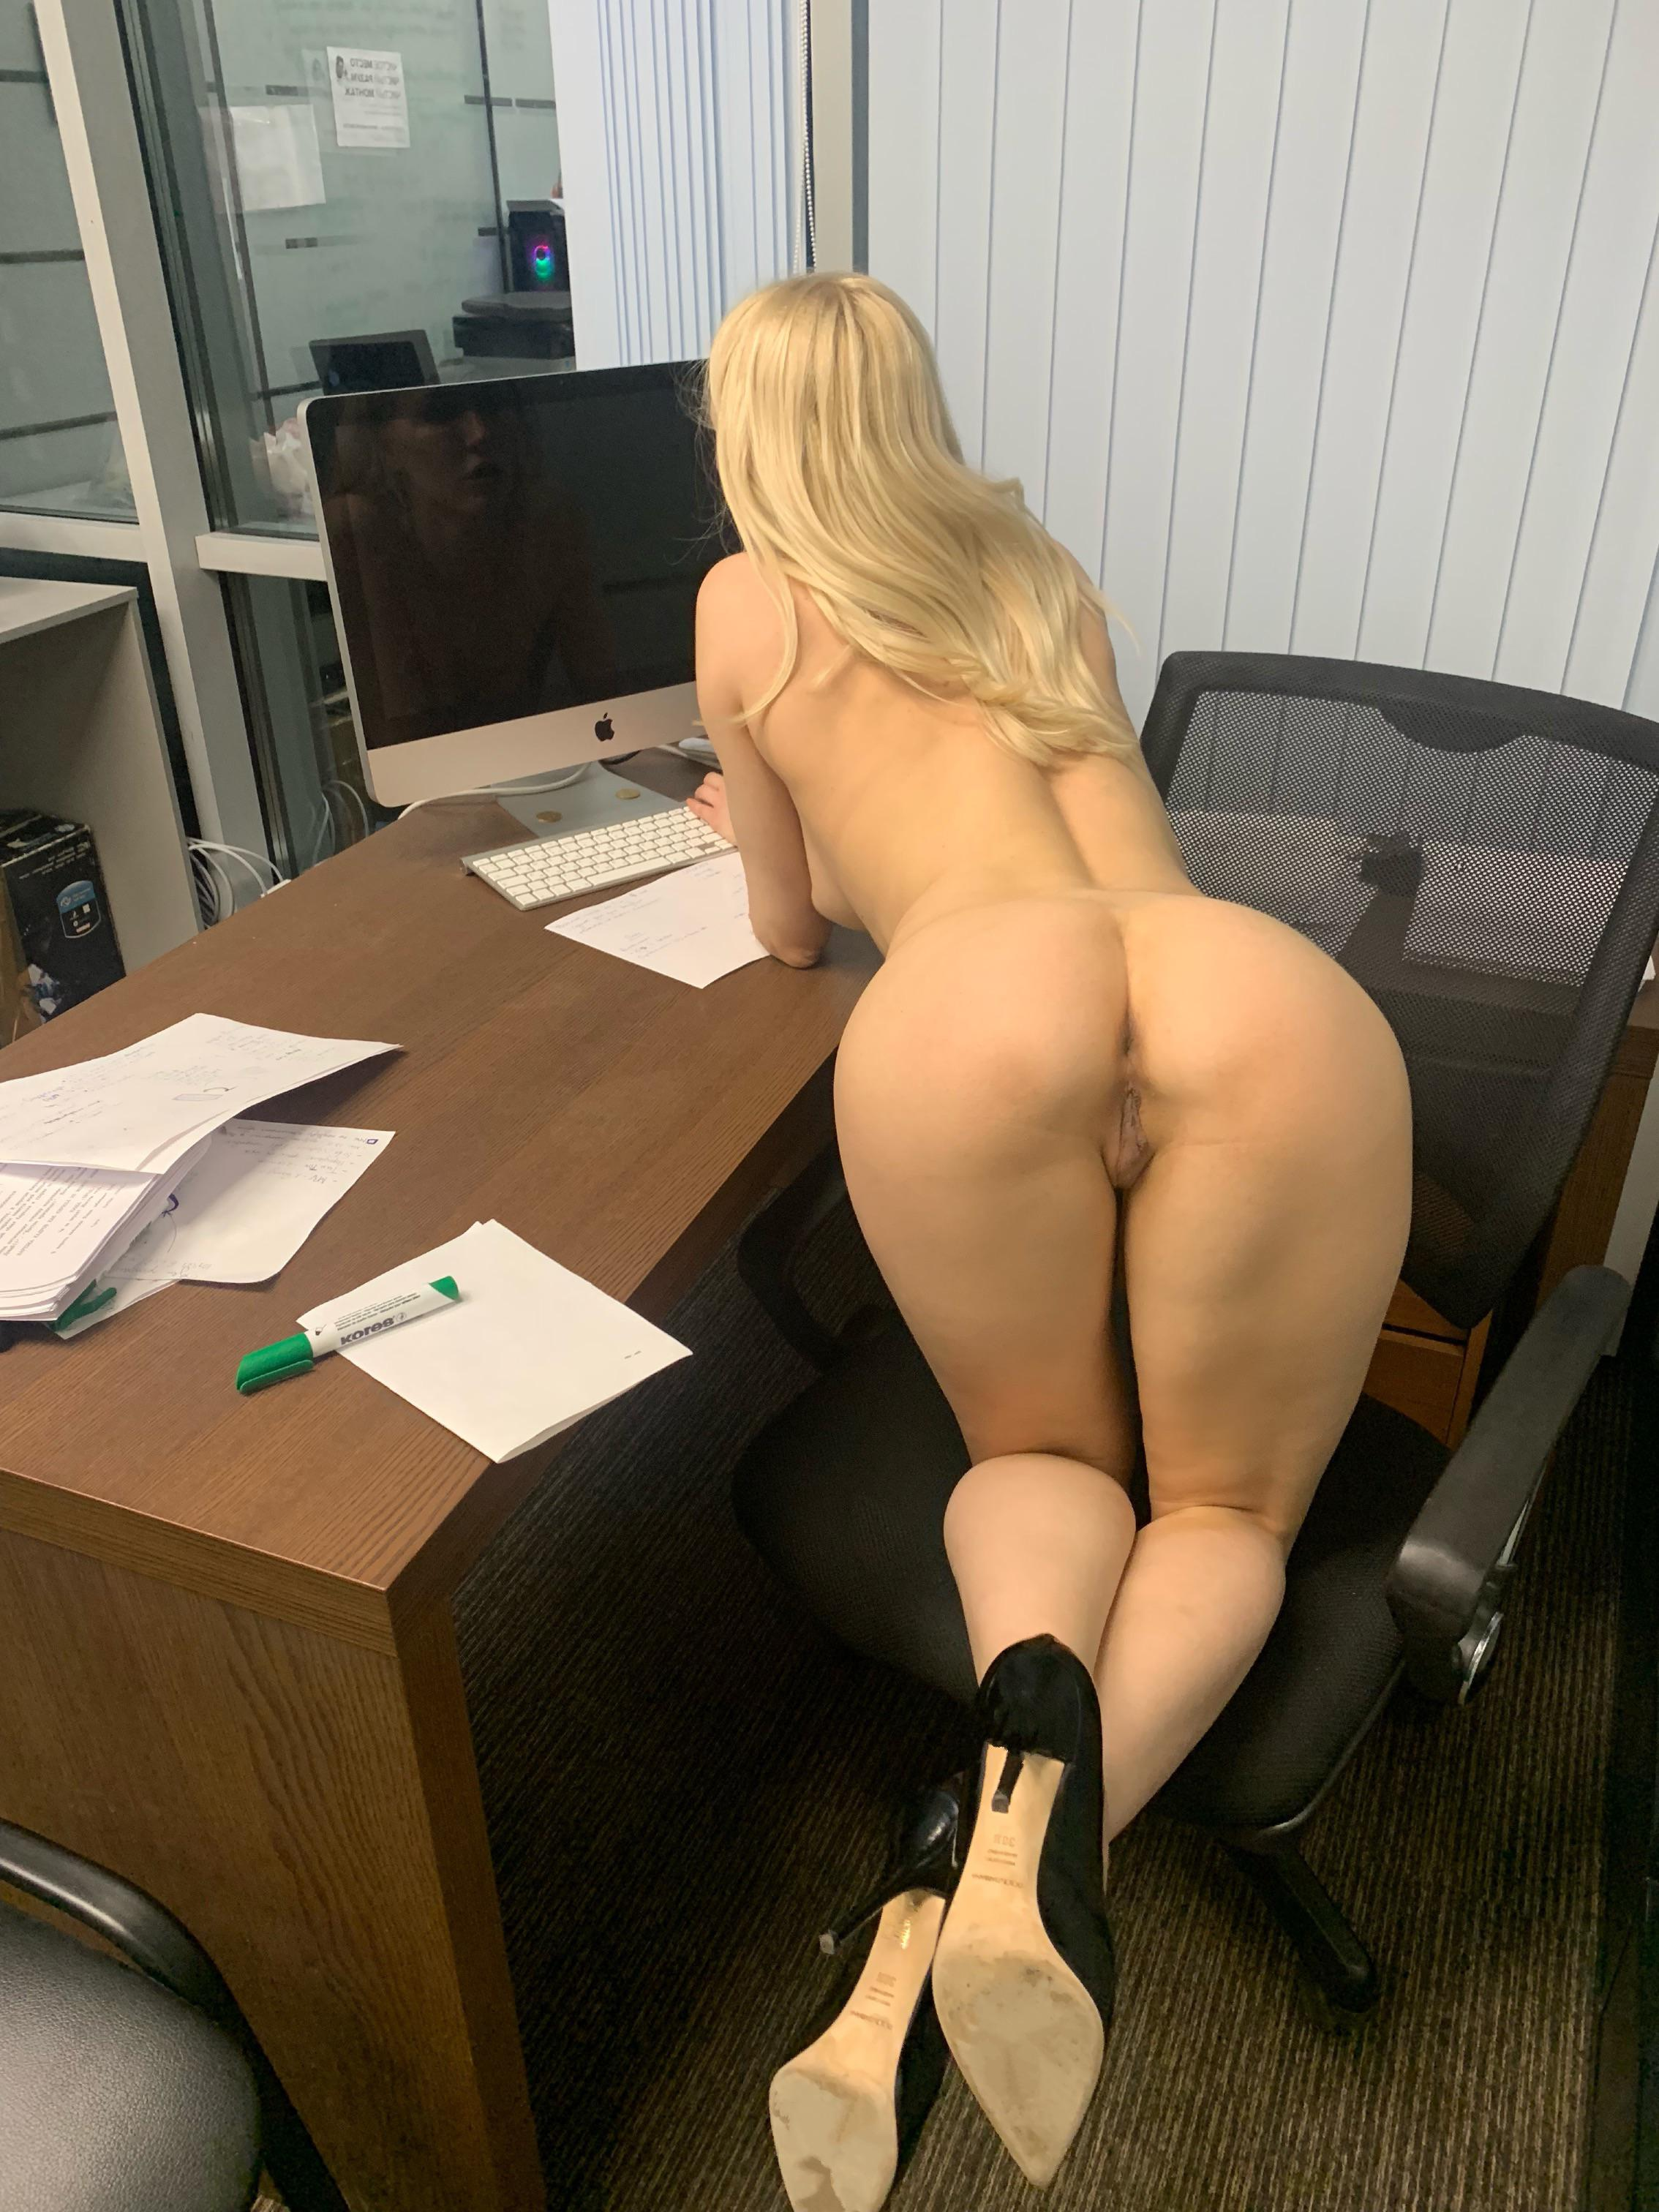 girls-naked-high-heels-pussy-mix-vol2-10